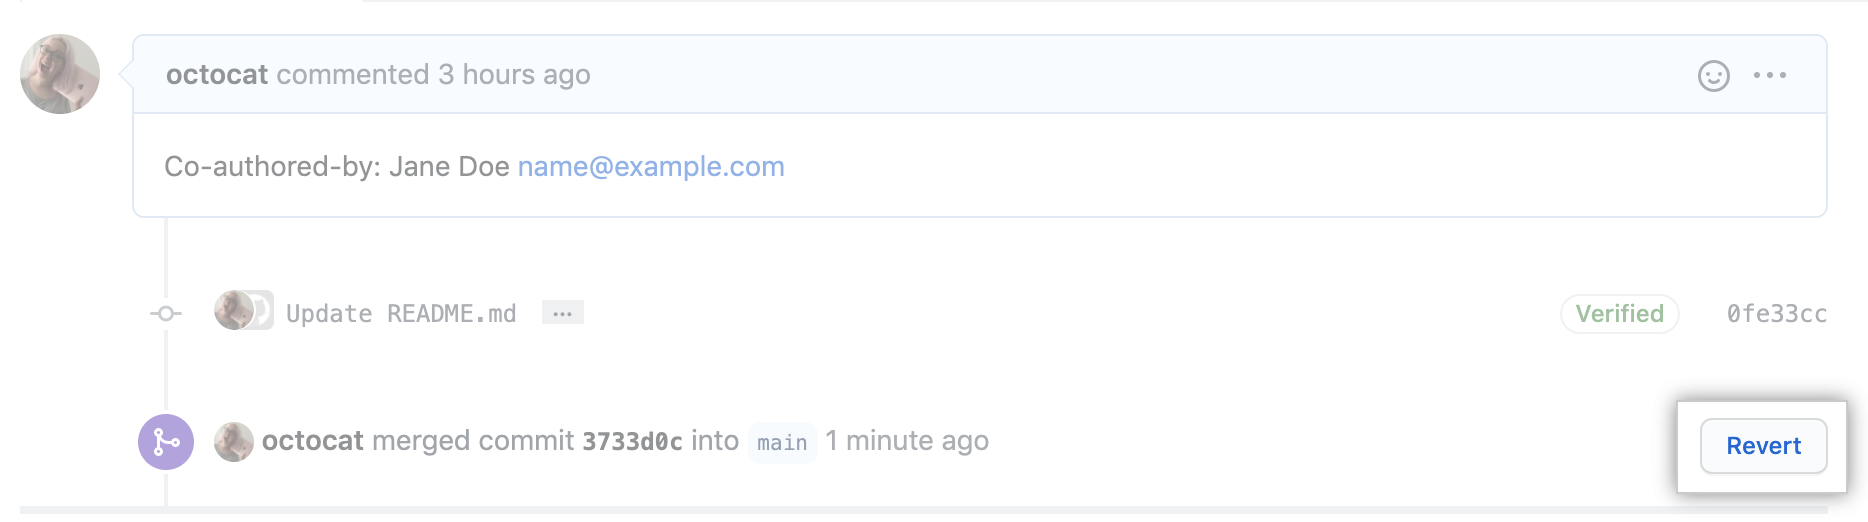 Revert pull request link